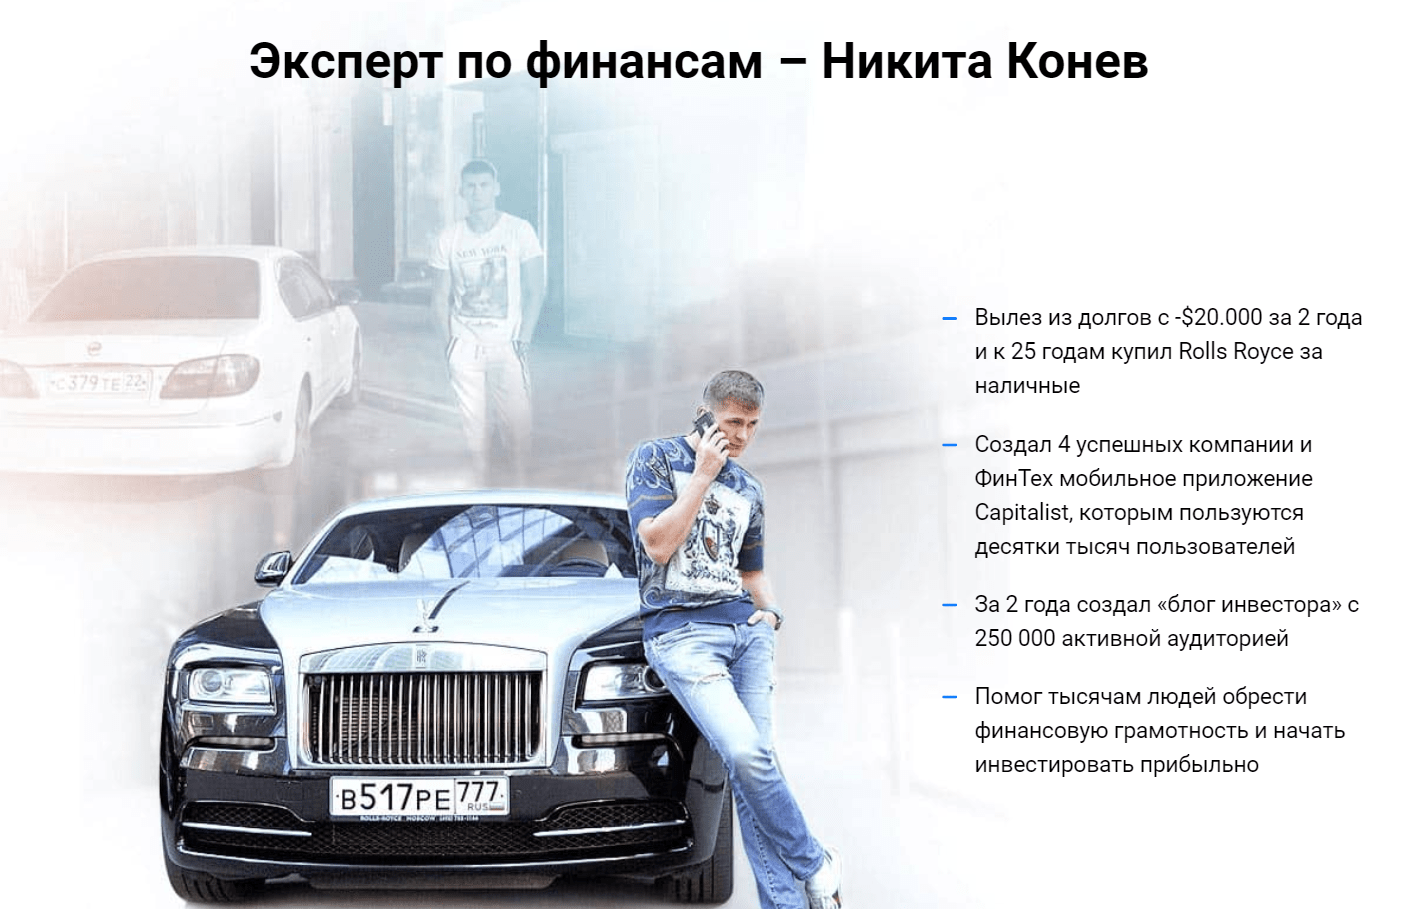 Никита Конев